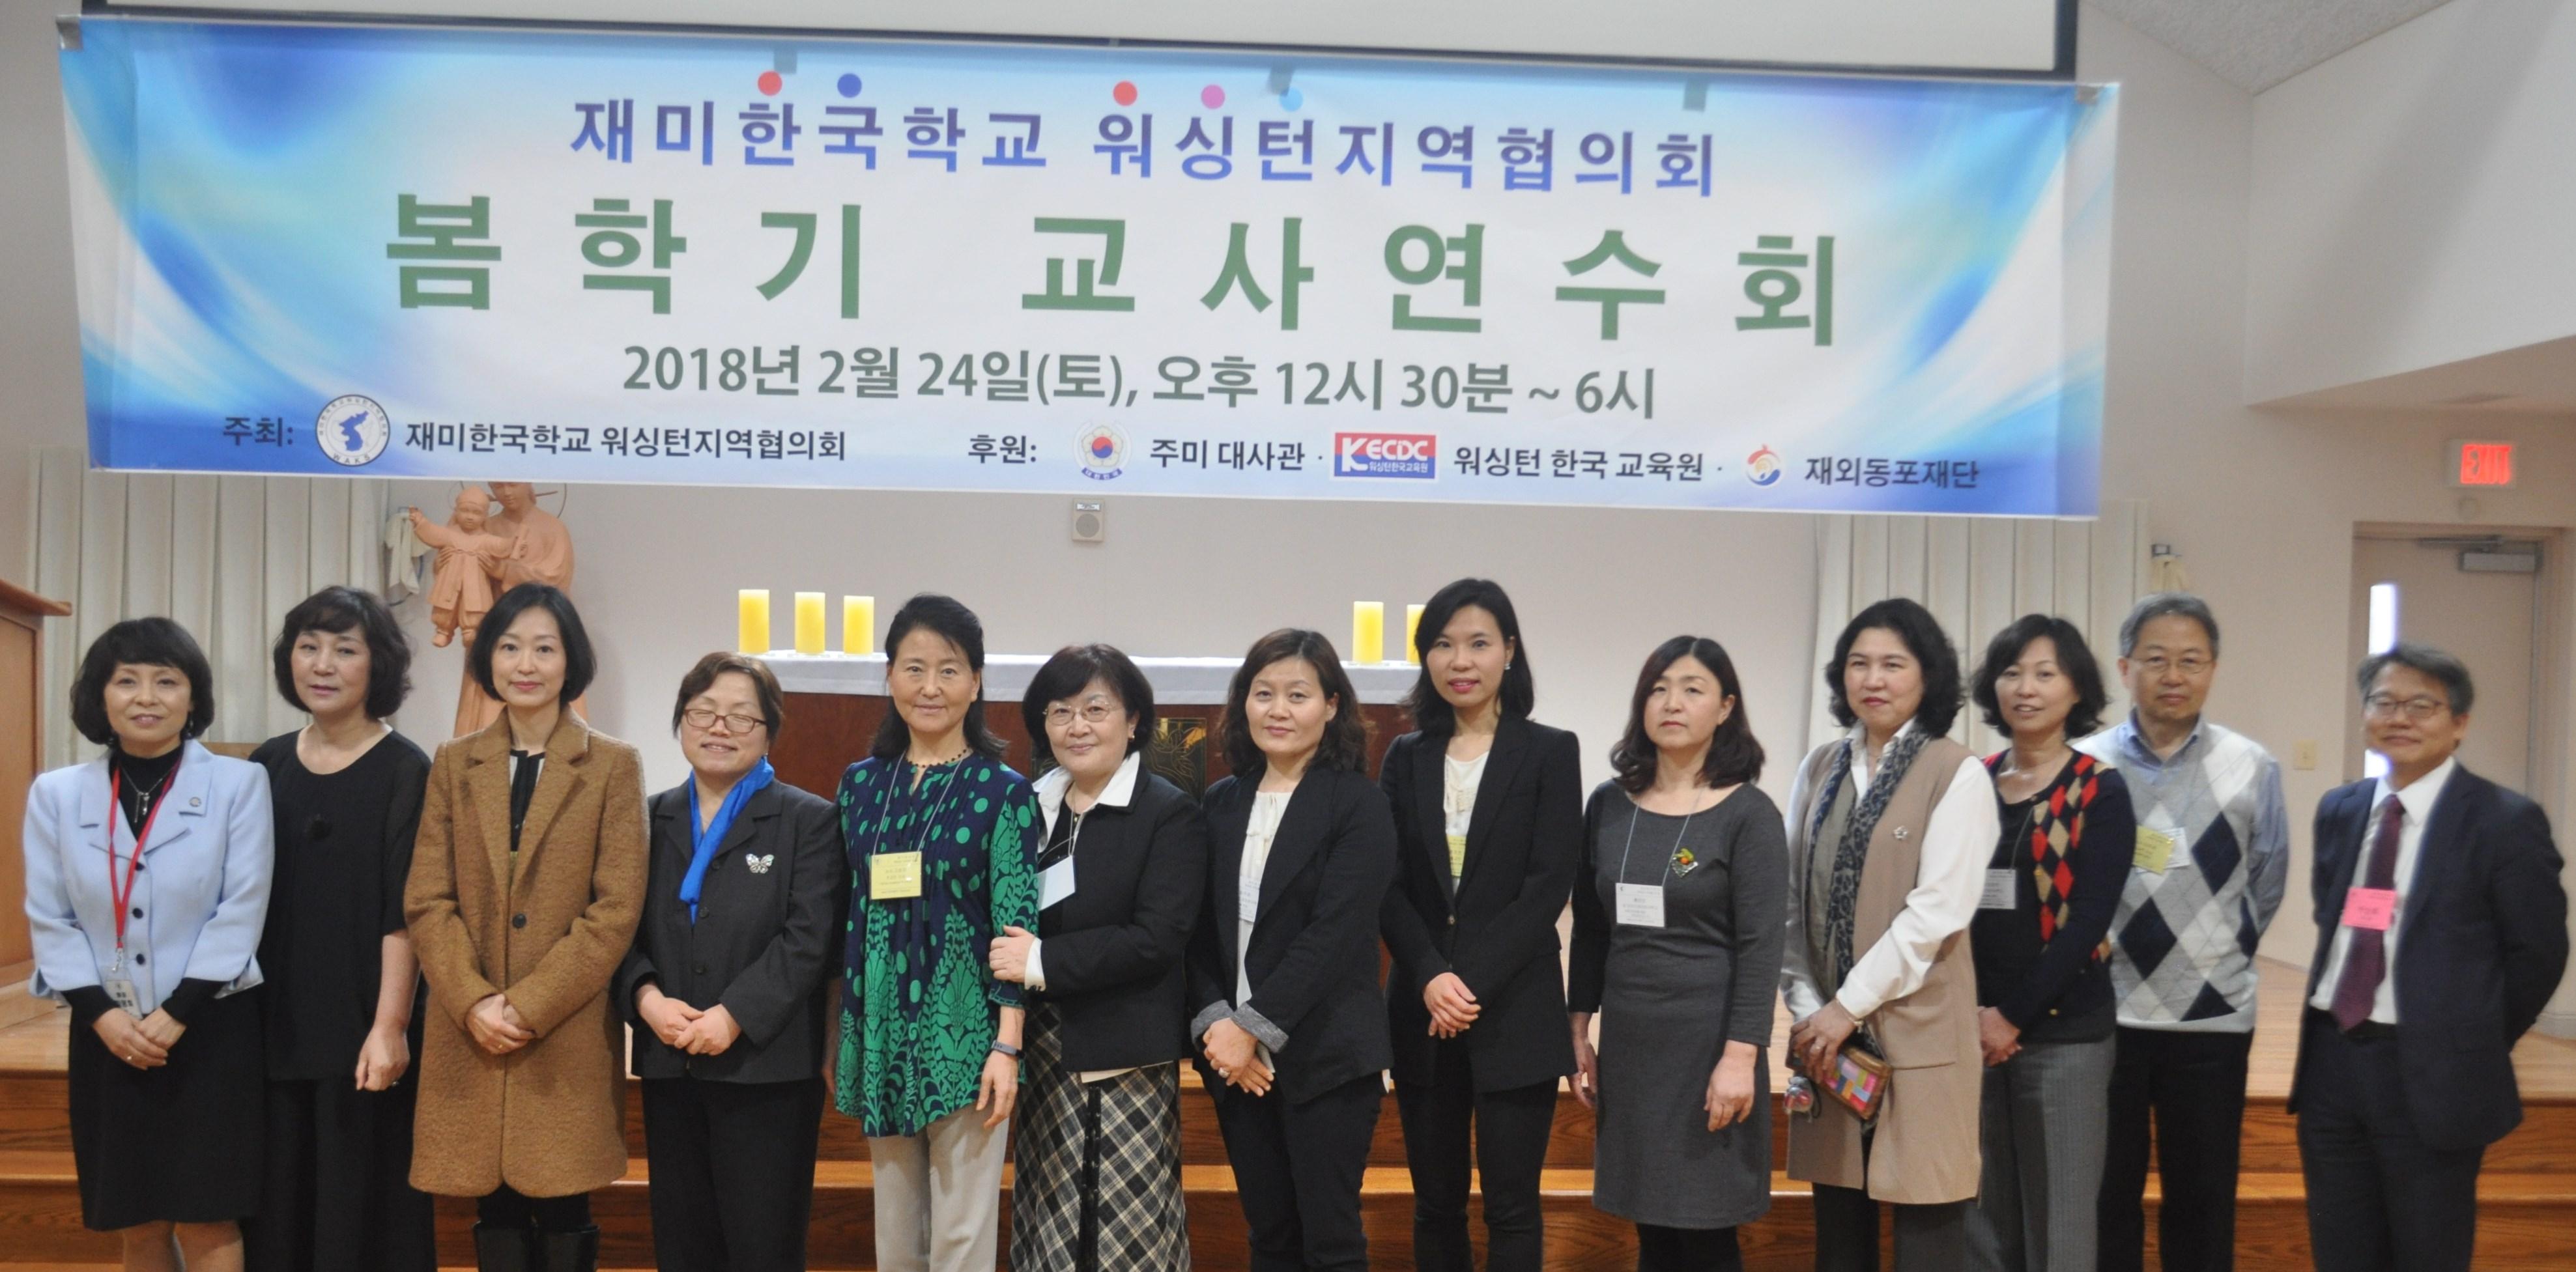 (20180224) WAKS 교사 연수회 11개 분반강사 사진.JPG